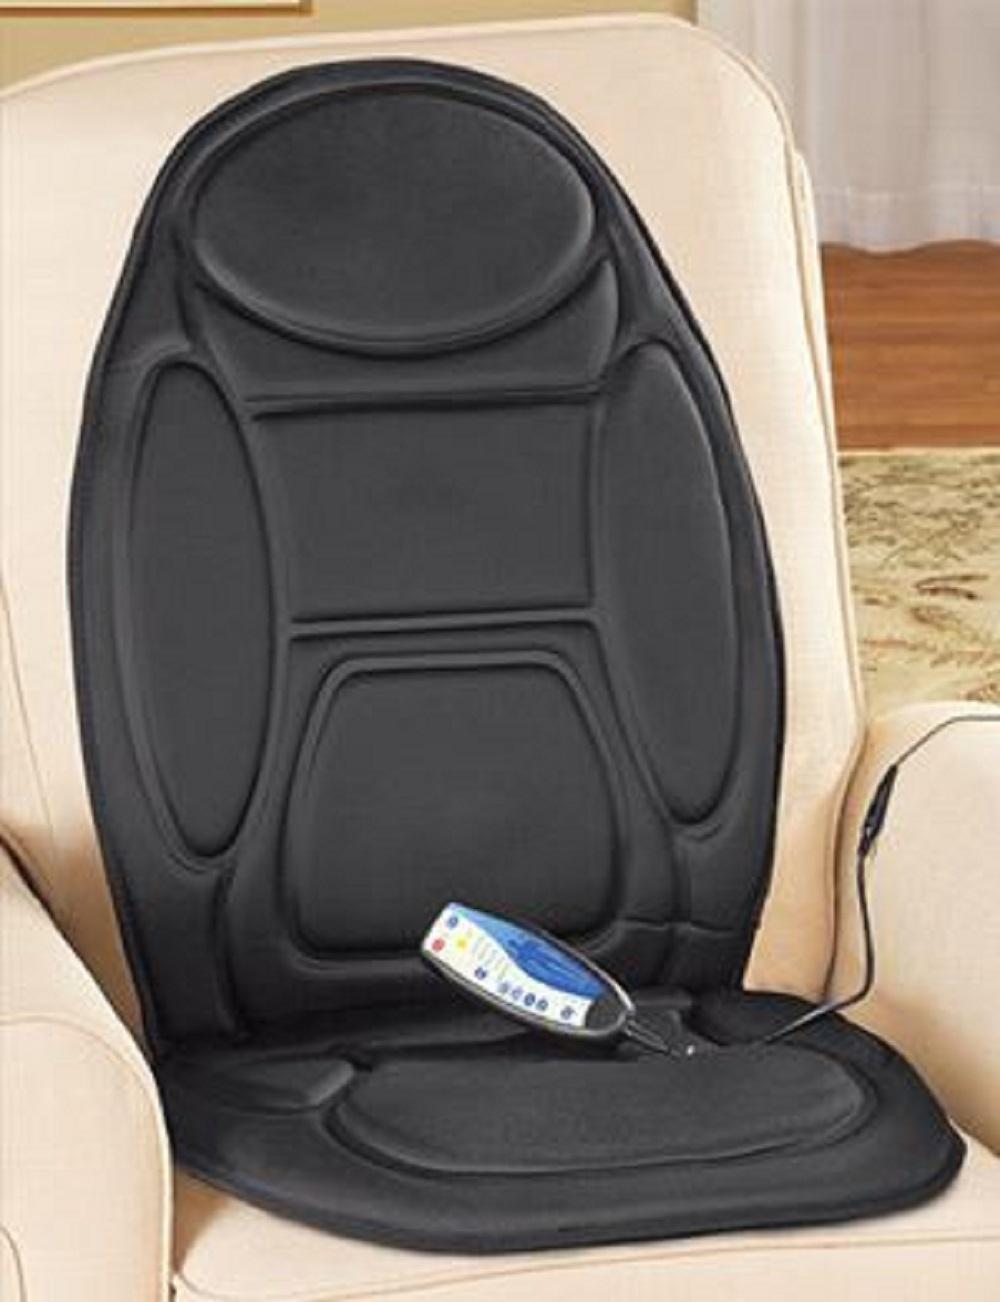 Vibrating Car Seat Cushion Massage Heat Portable Back Chair Neck Lumbar Flex